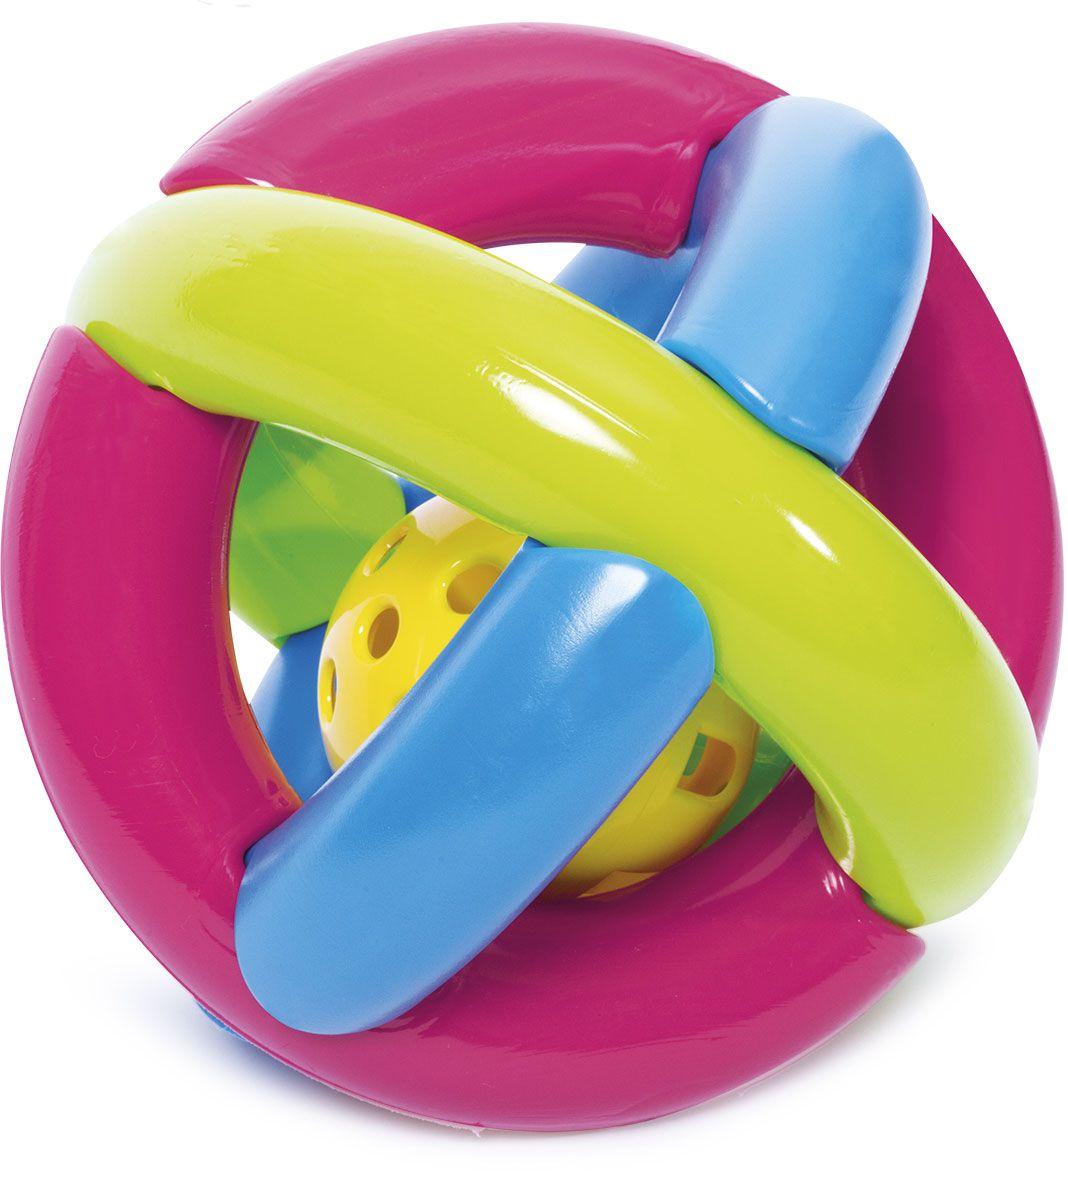 Kit de Brinquedos para bebê de 1 ano